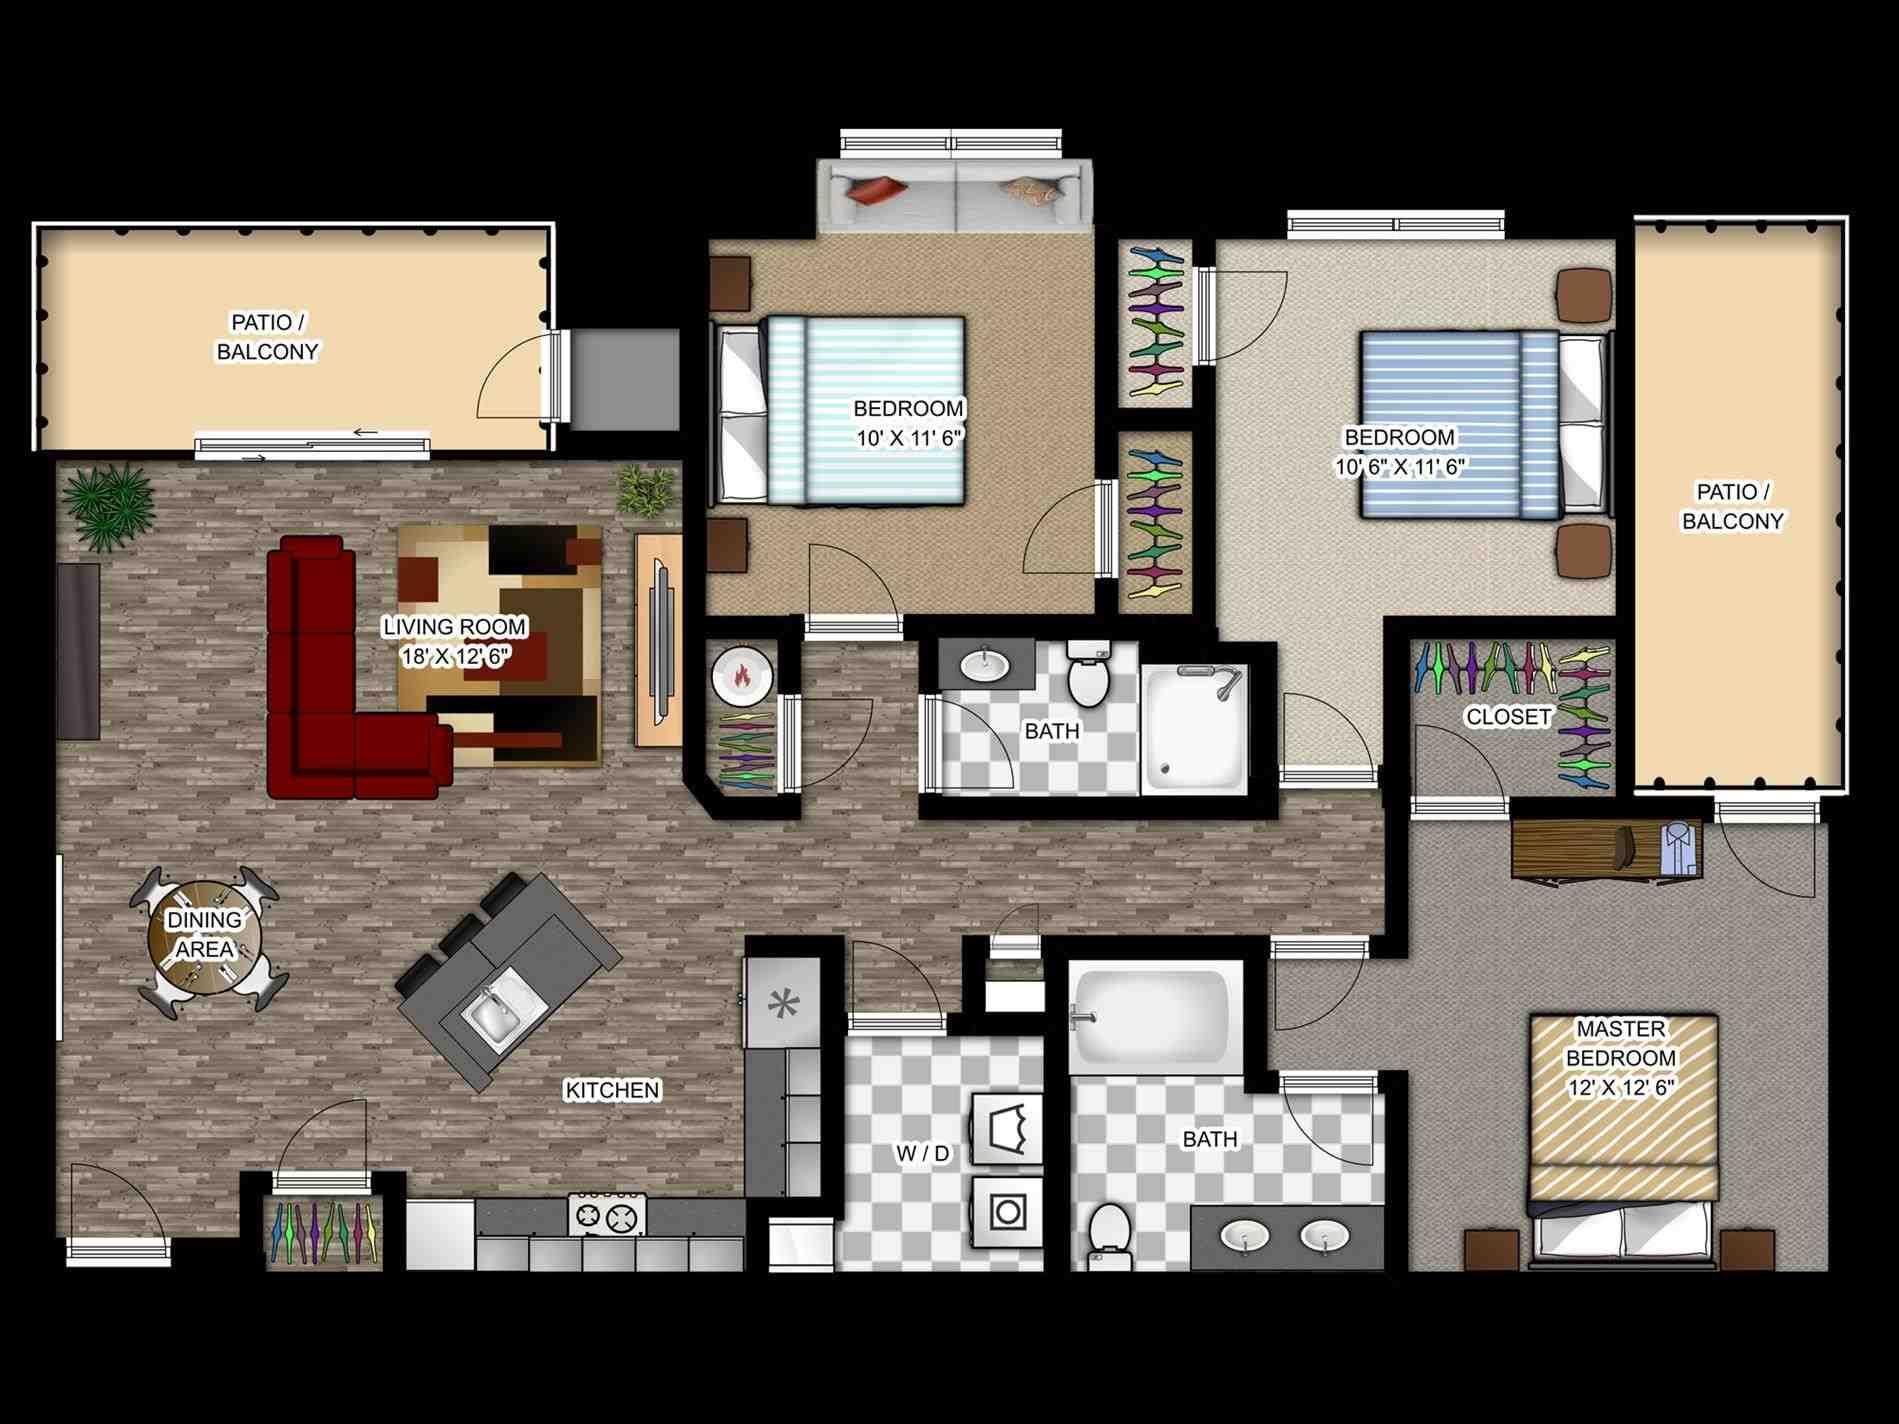 Luxury Apartment Floor Plans B1 2 Bedroom View Floor Plan Cool Showy Studio Apartment Design Bedroom House Plans Modern House Floor Plans Apartment Sites